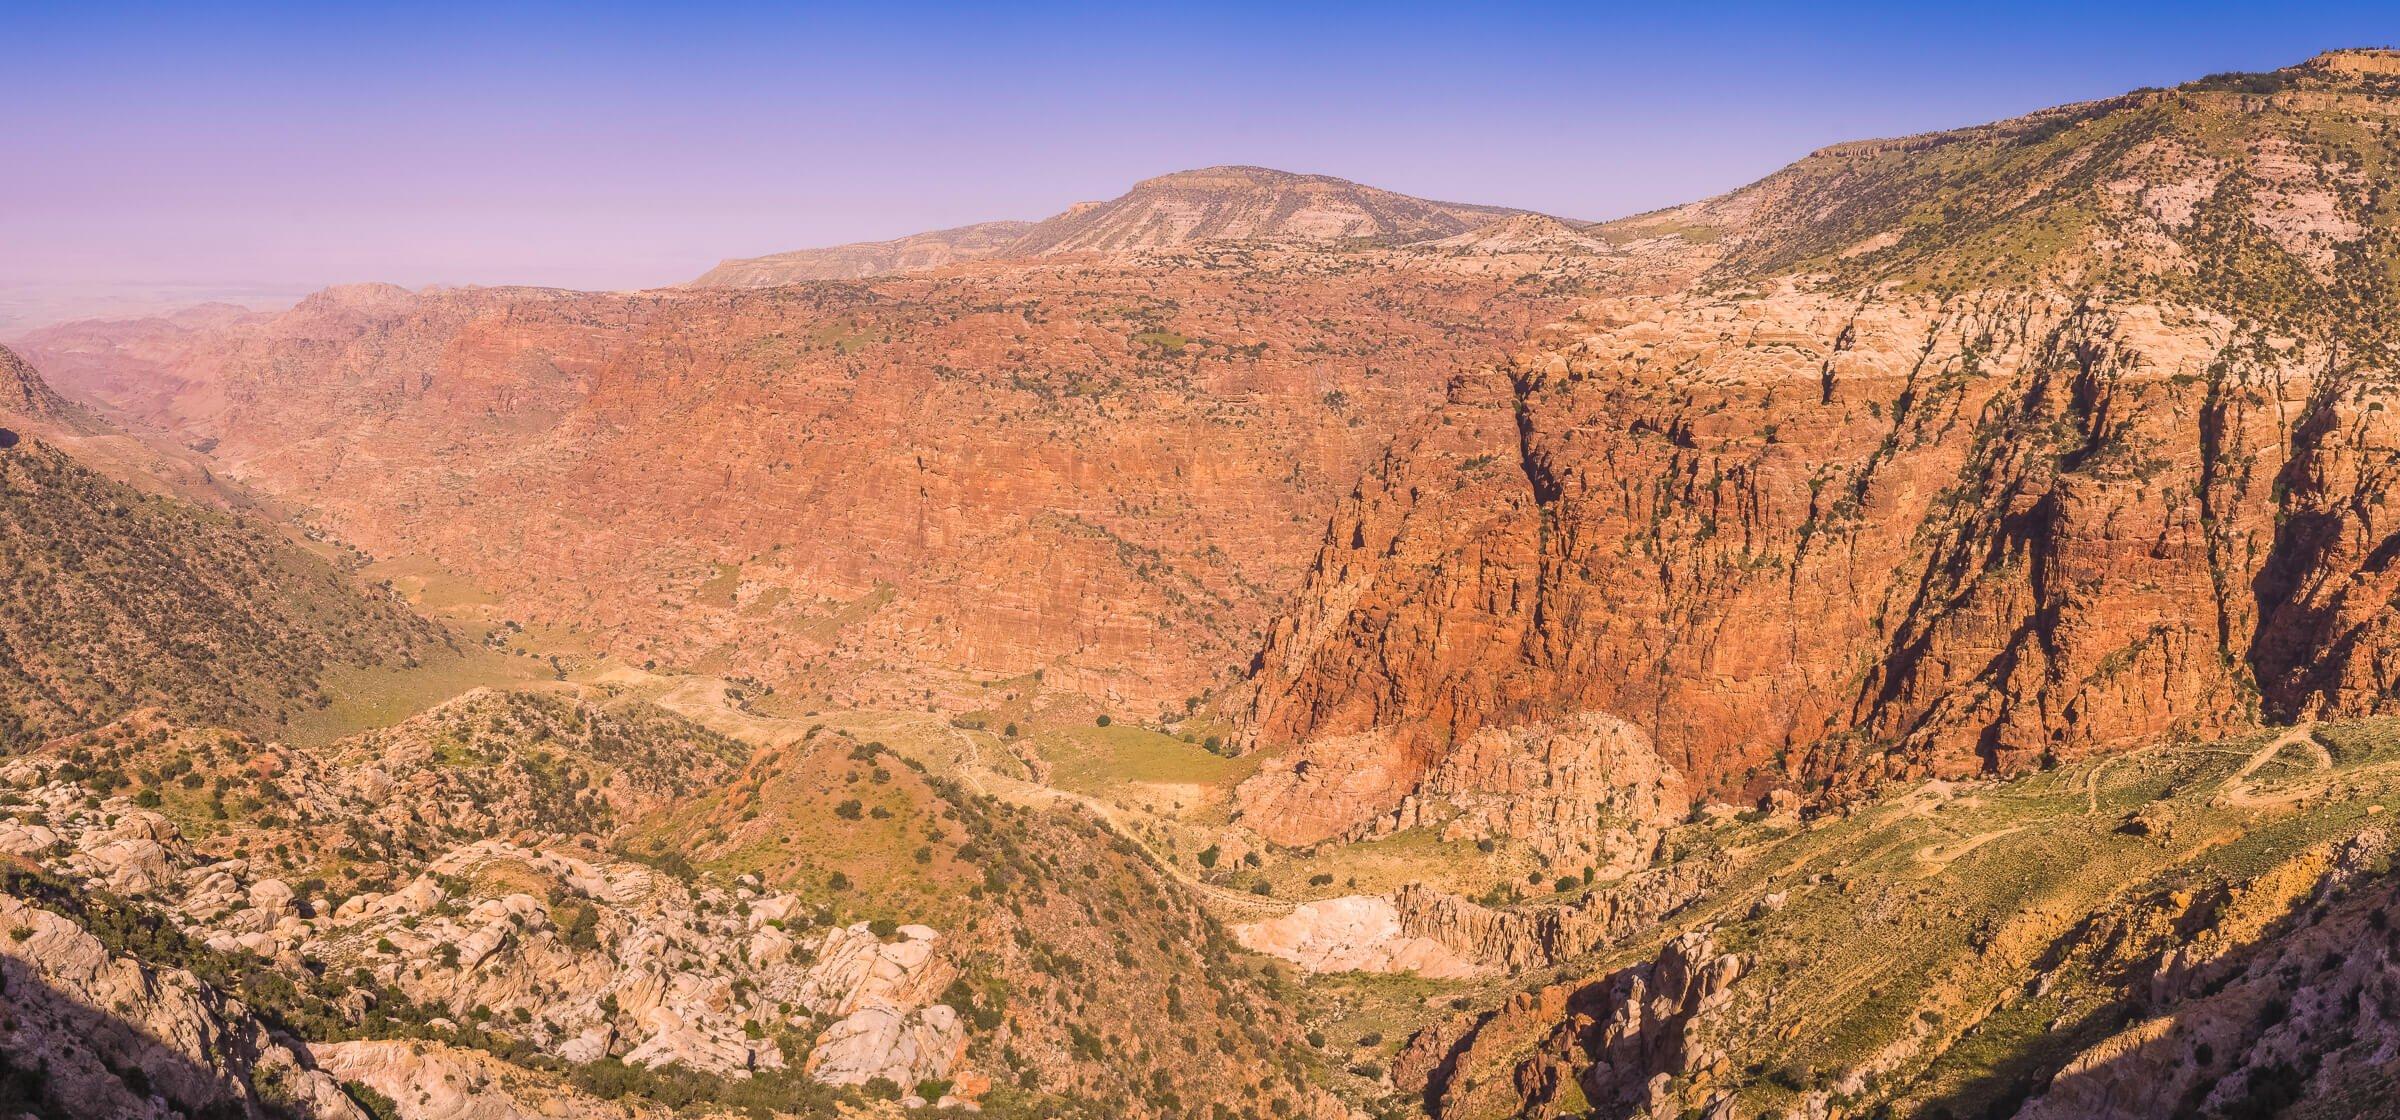 Dana Valley, Jordan